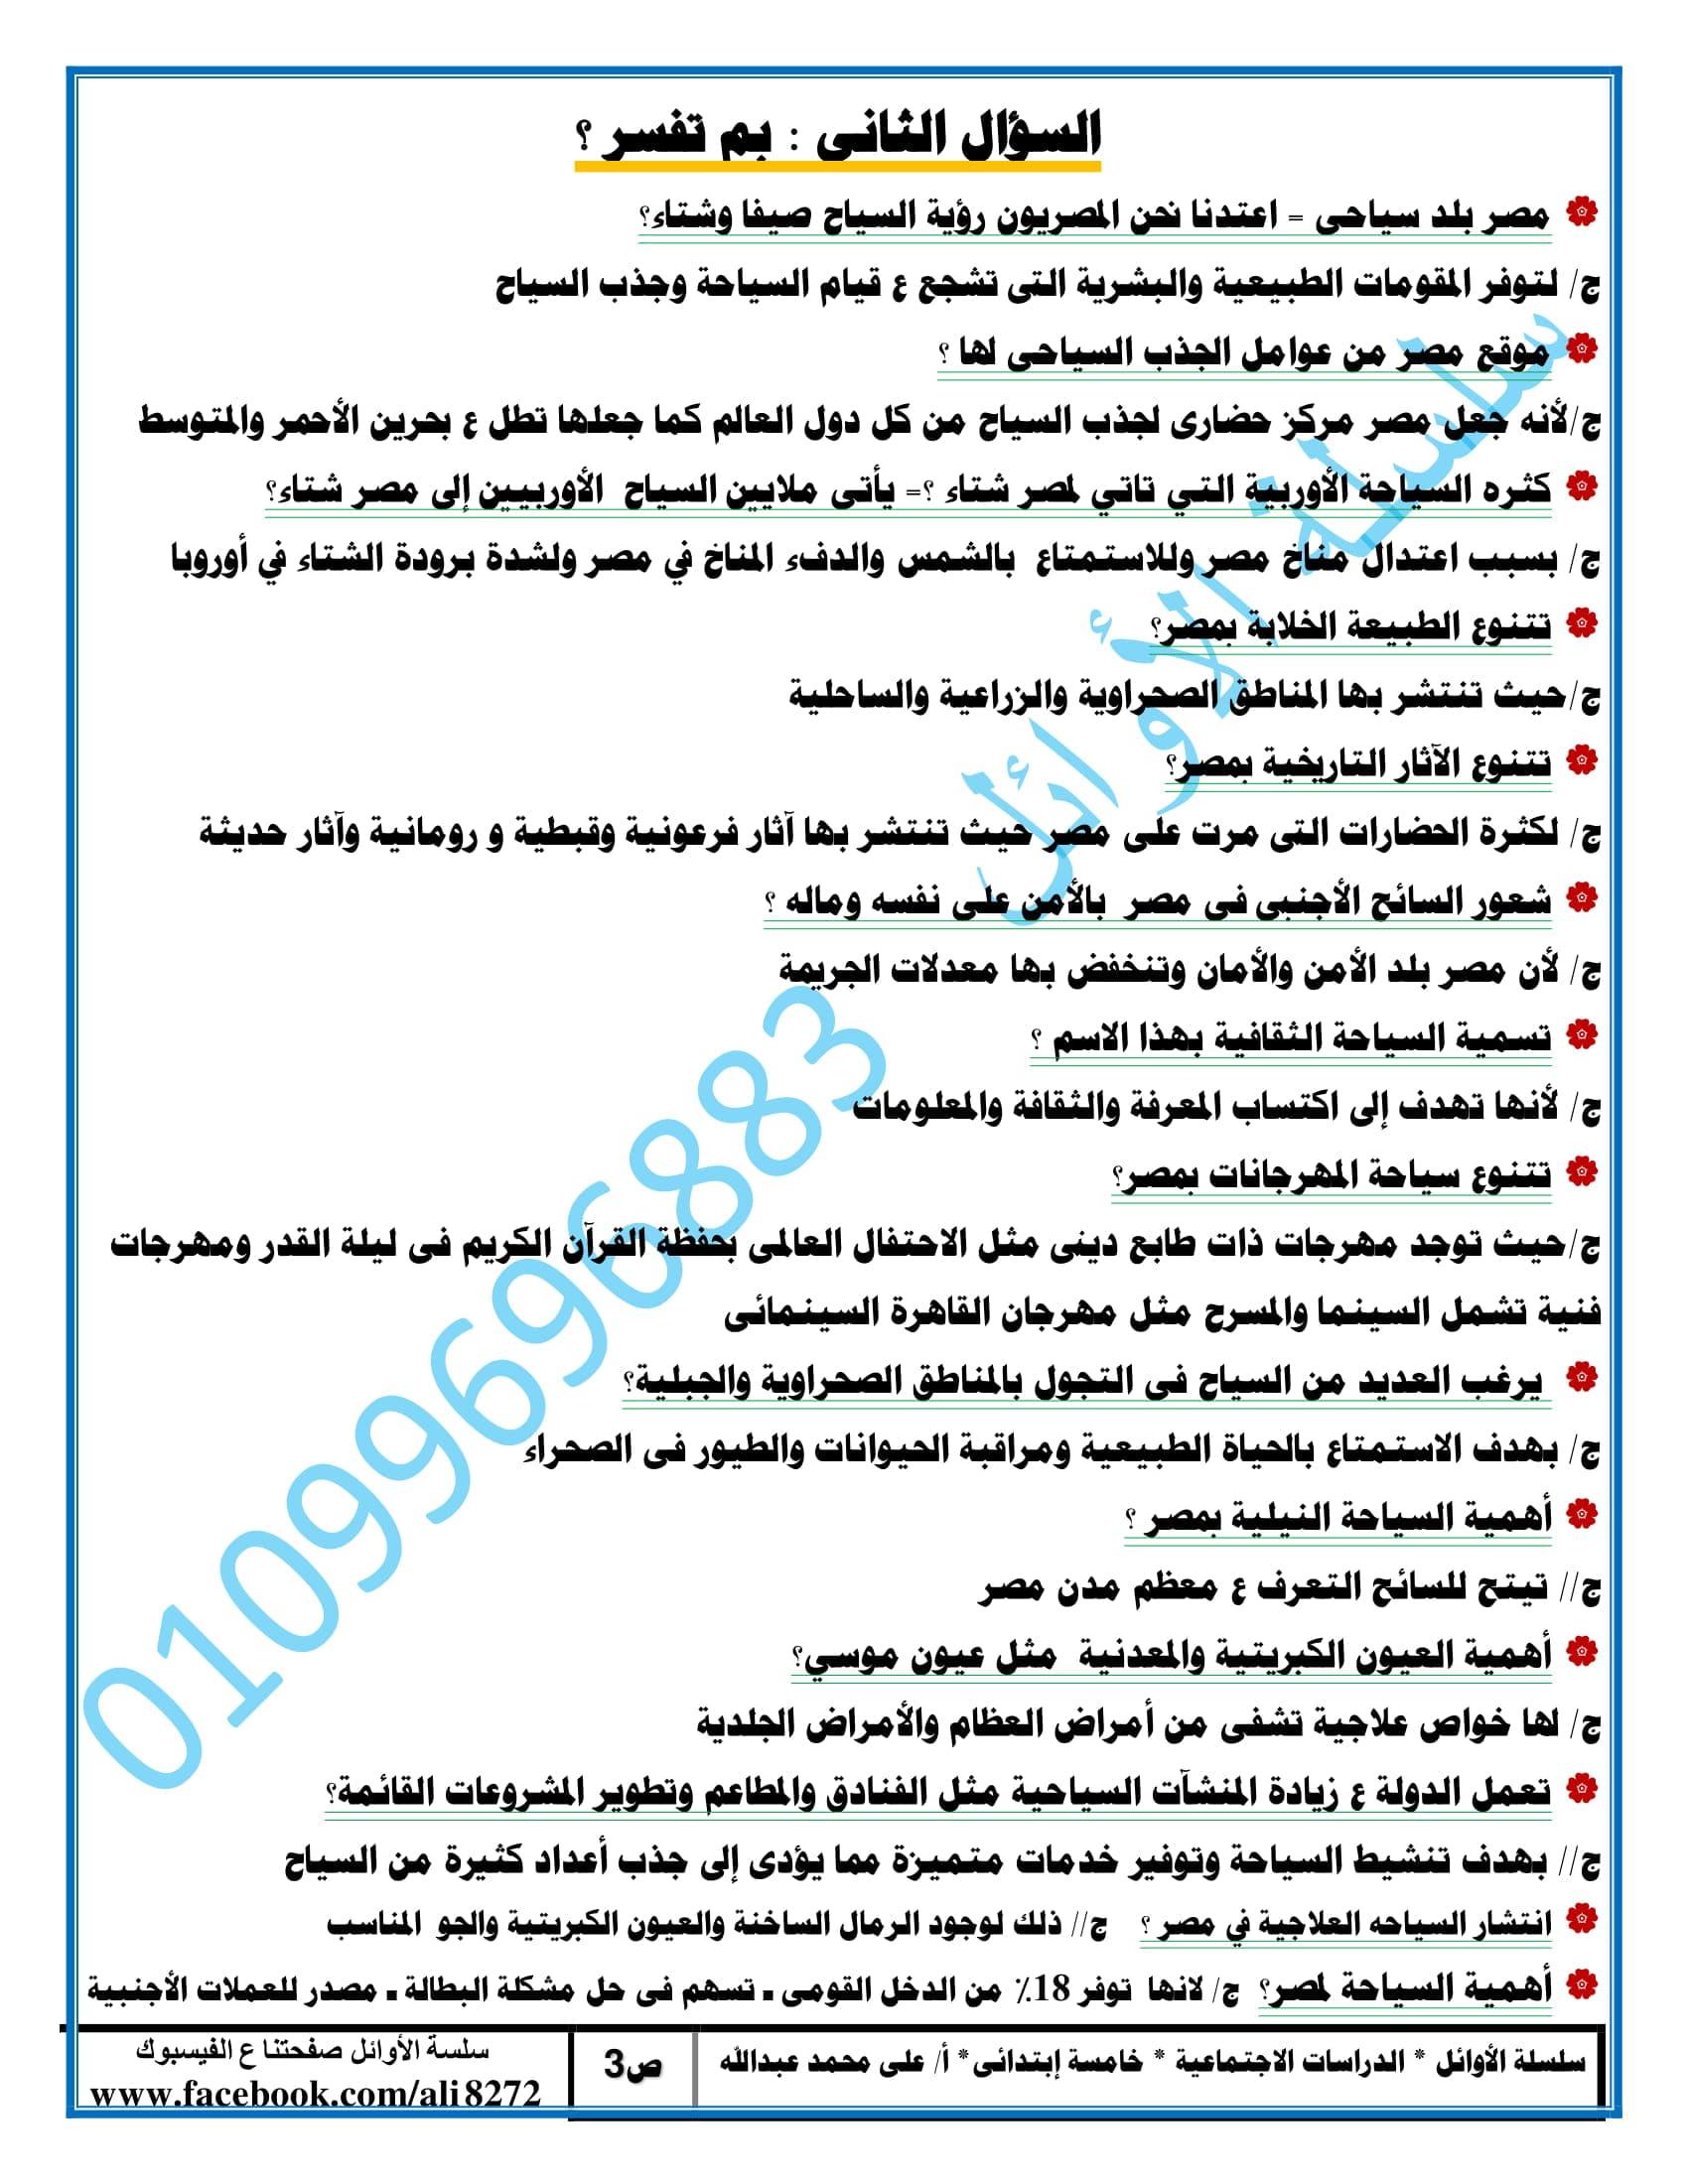 exam-eg.com_152337365716491.jpg